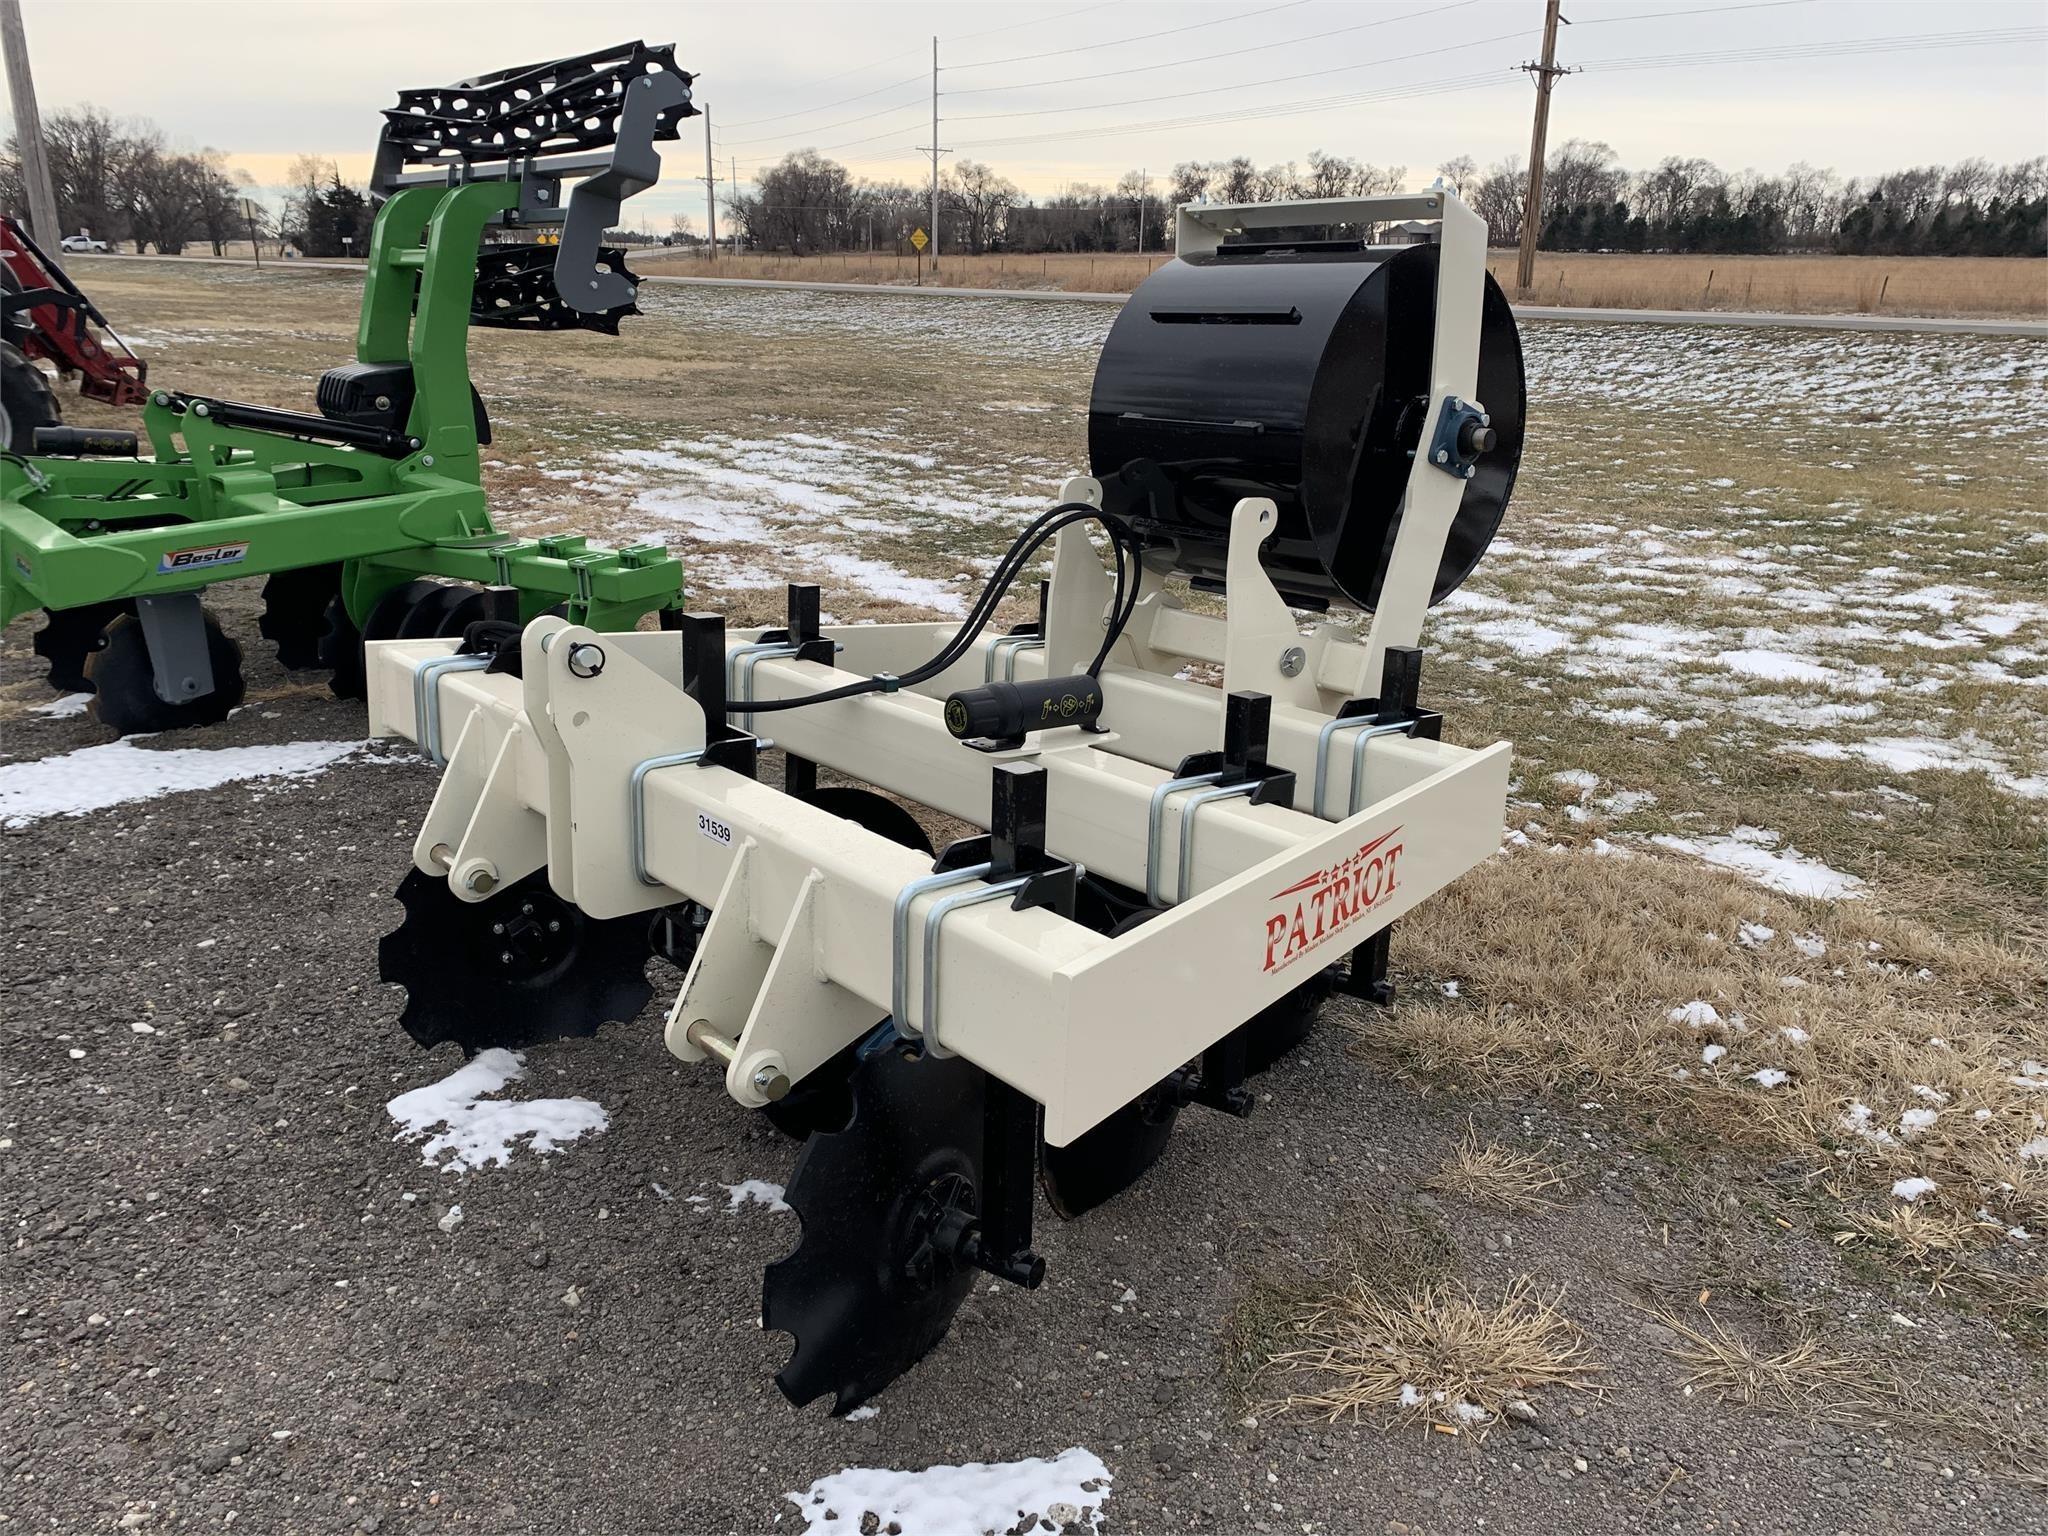 2020 Patriot Pivot Track Closer Irrigation